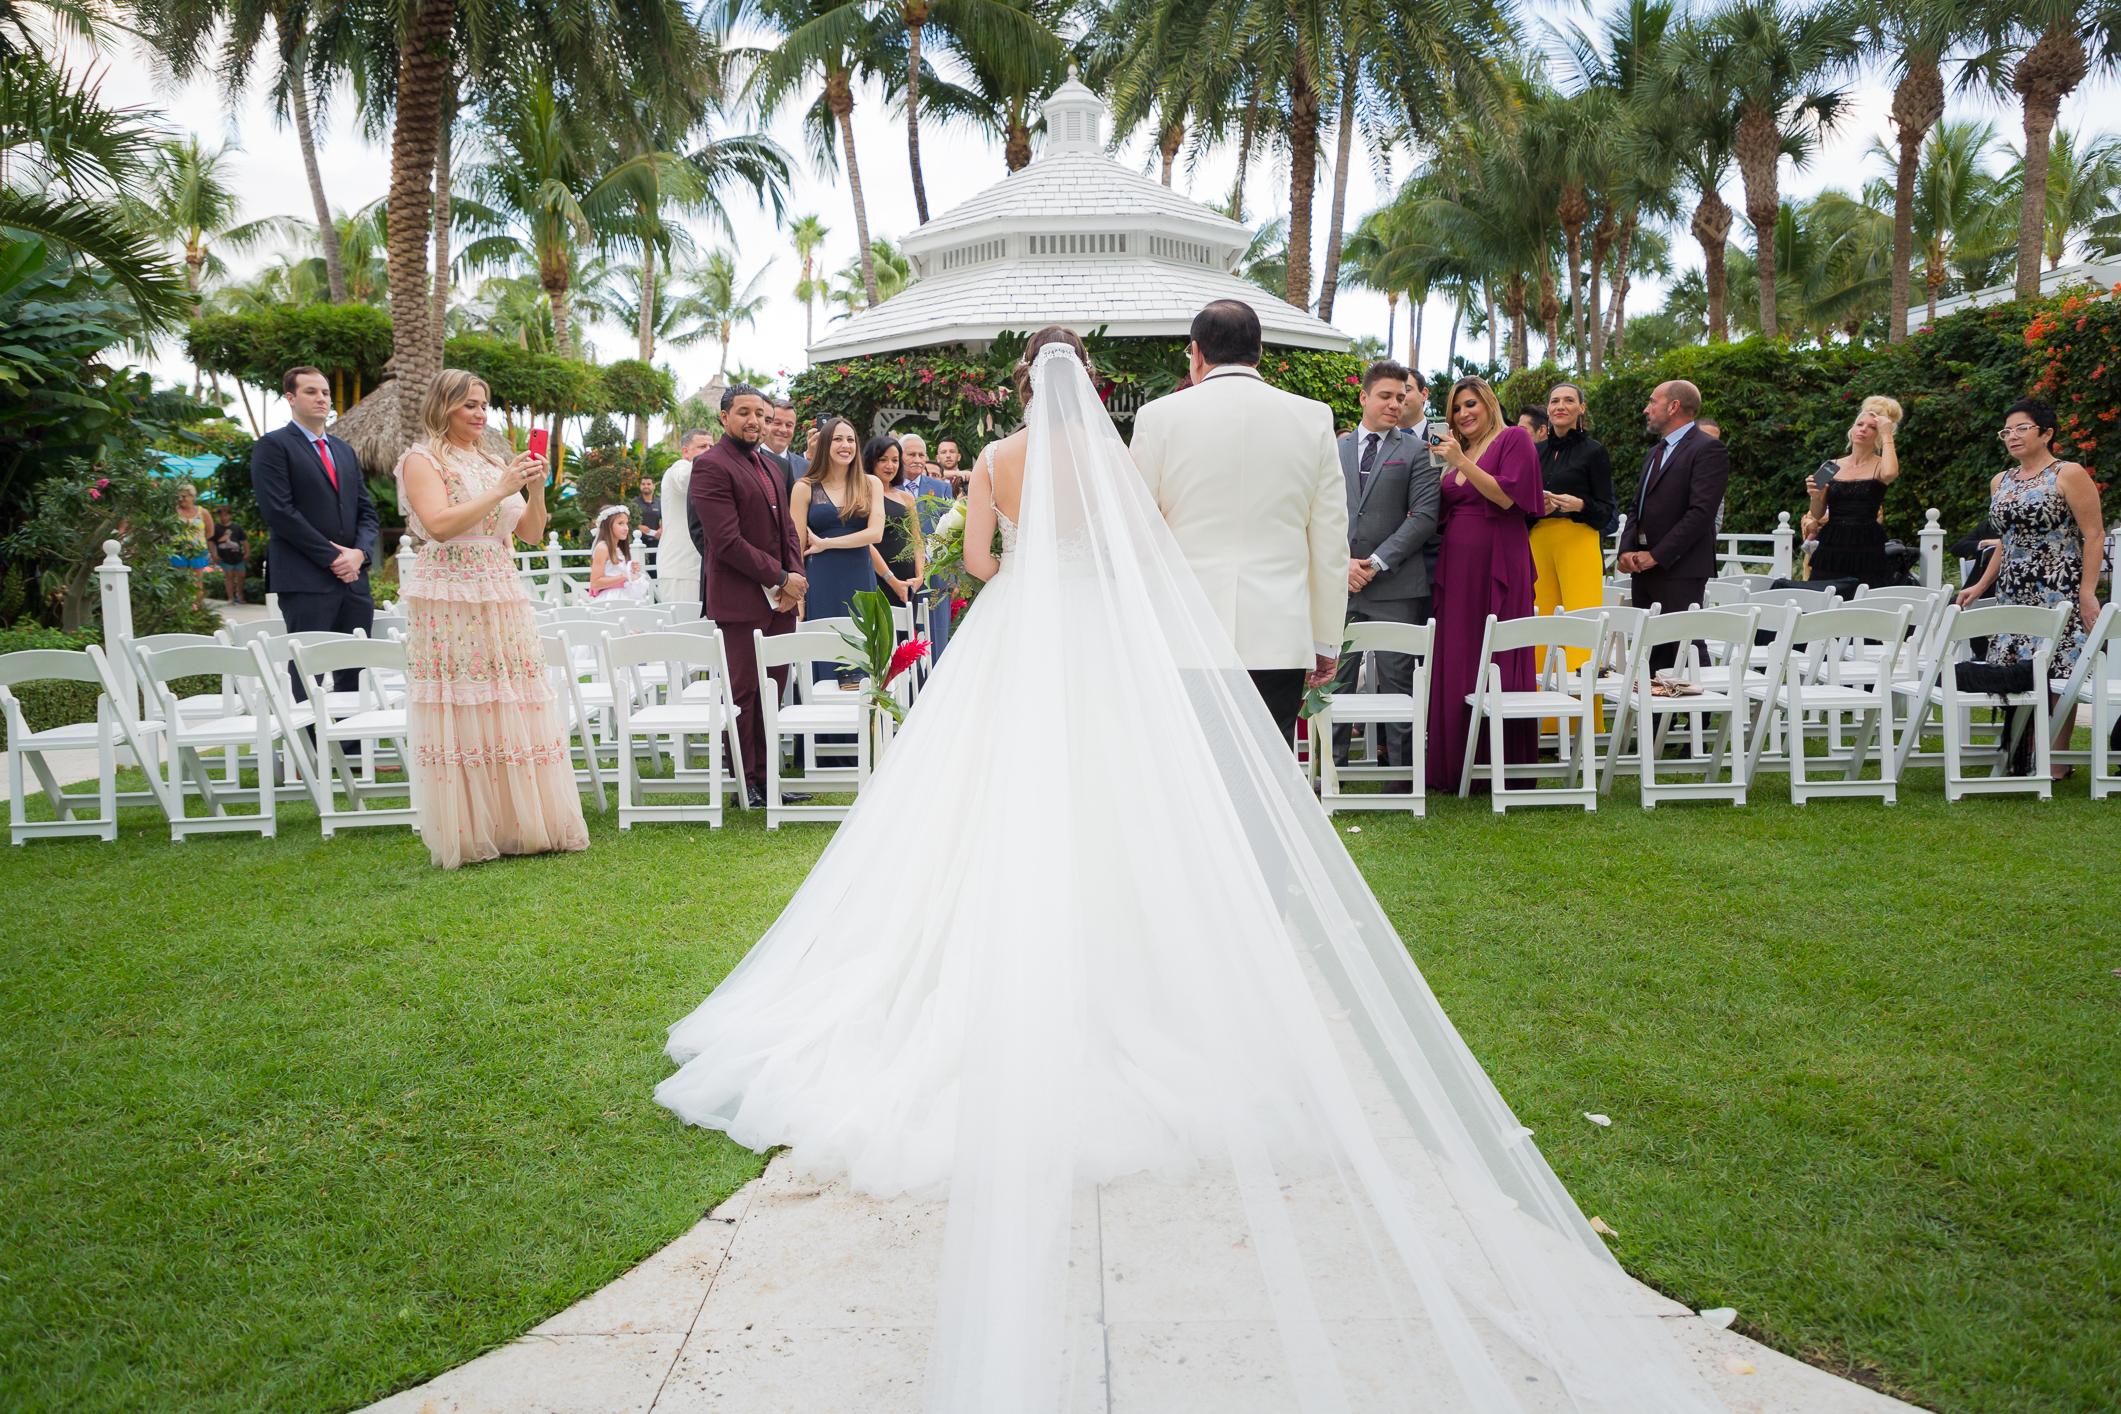 The Palms Hotel Miami Wedding - Miami Wedding Photographer Dipp Photography